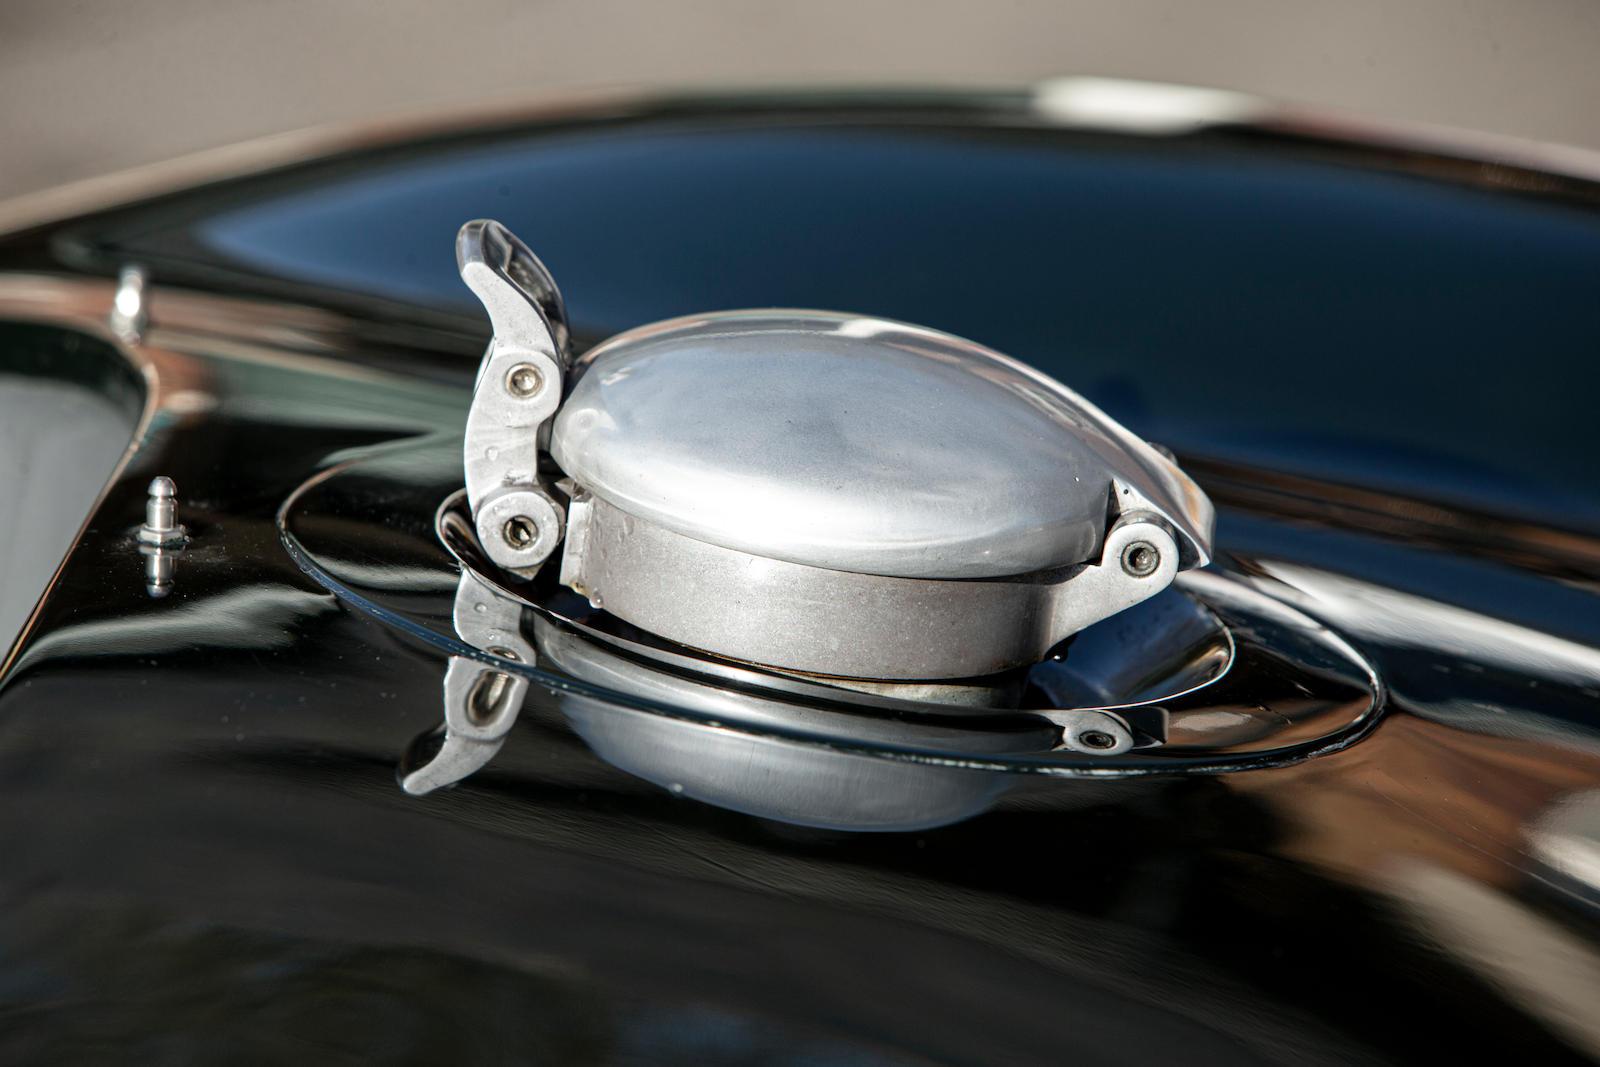 1952 Jaguar XK120 C-Type fuel cap